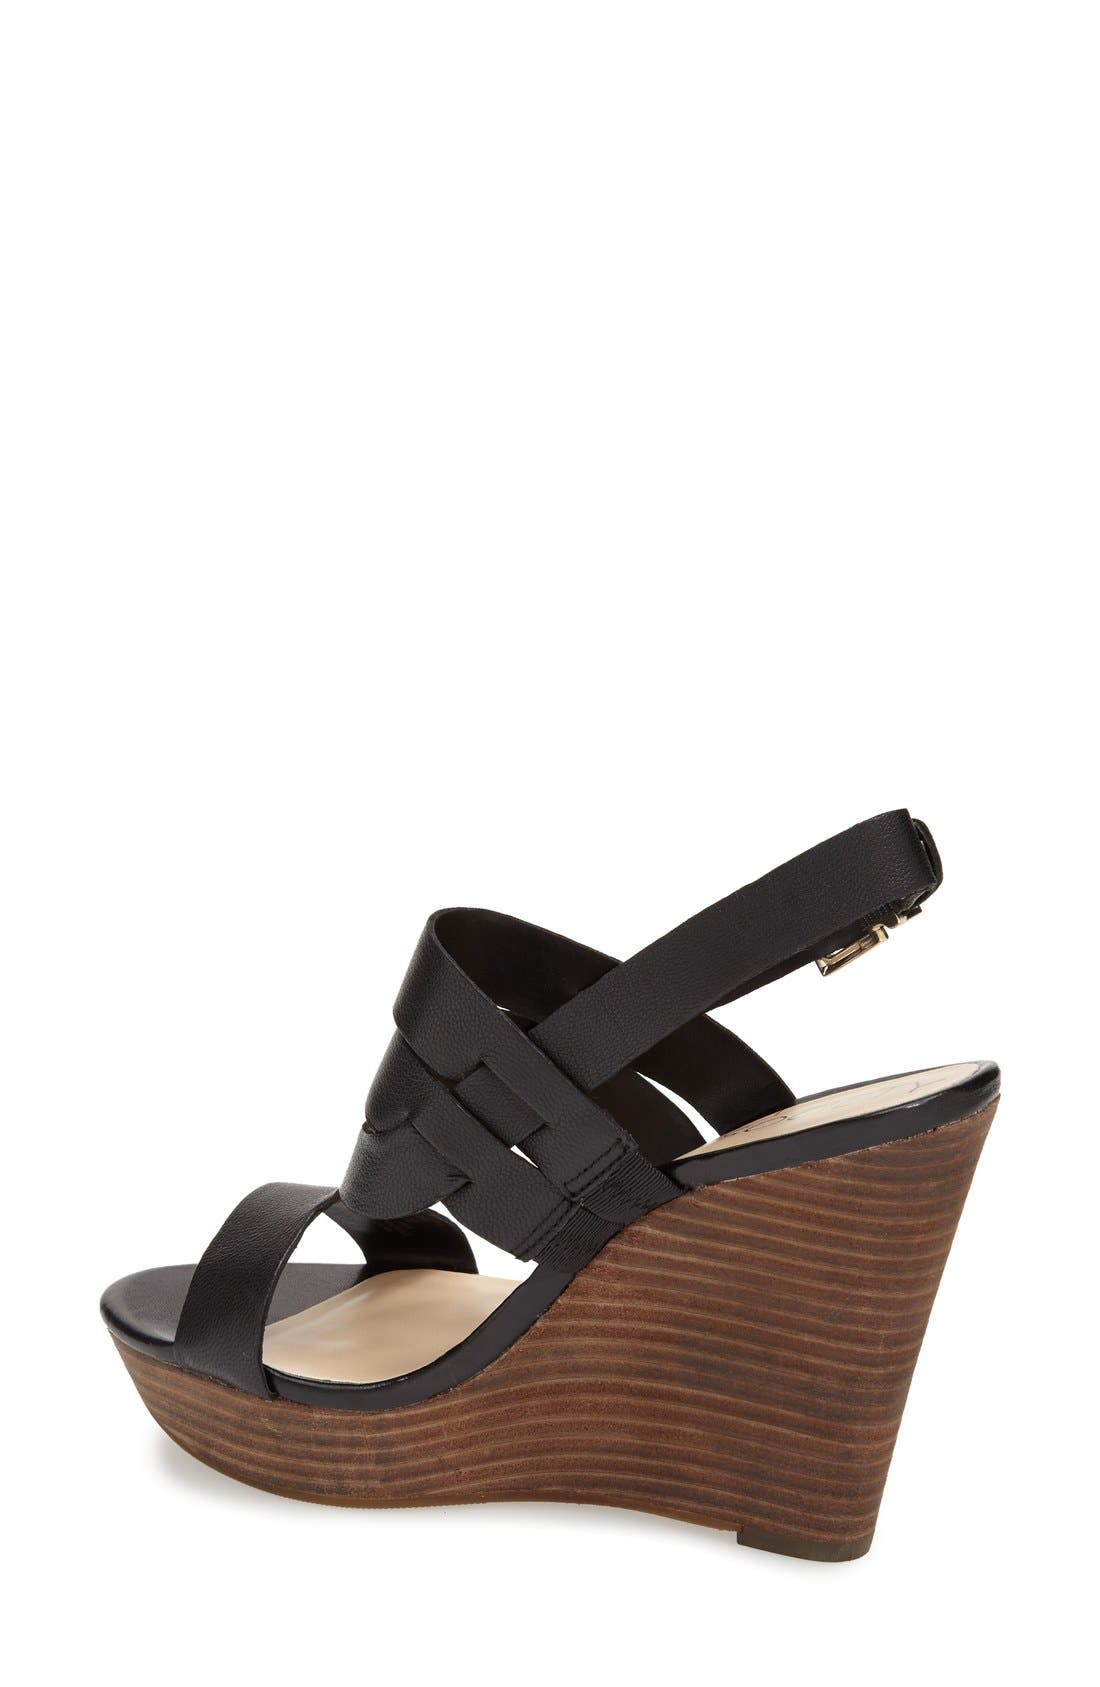 Alternate Image 2  - Sole Society 'Jenny' Slingback Wedge Sandal (Women)